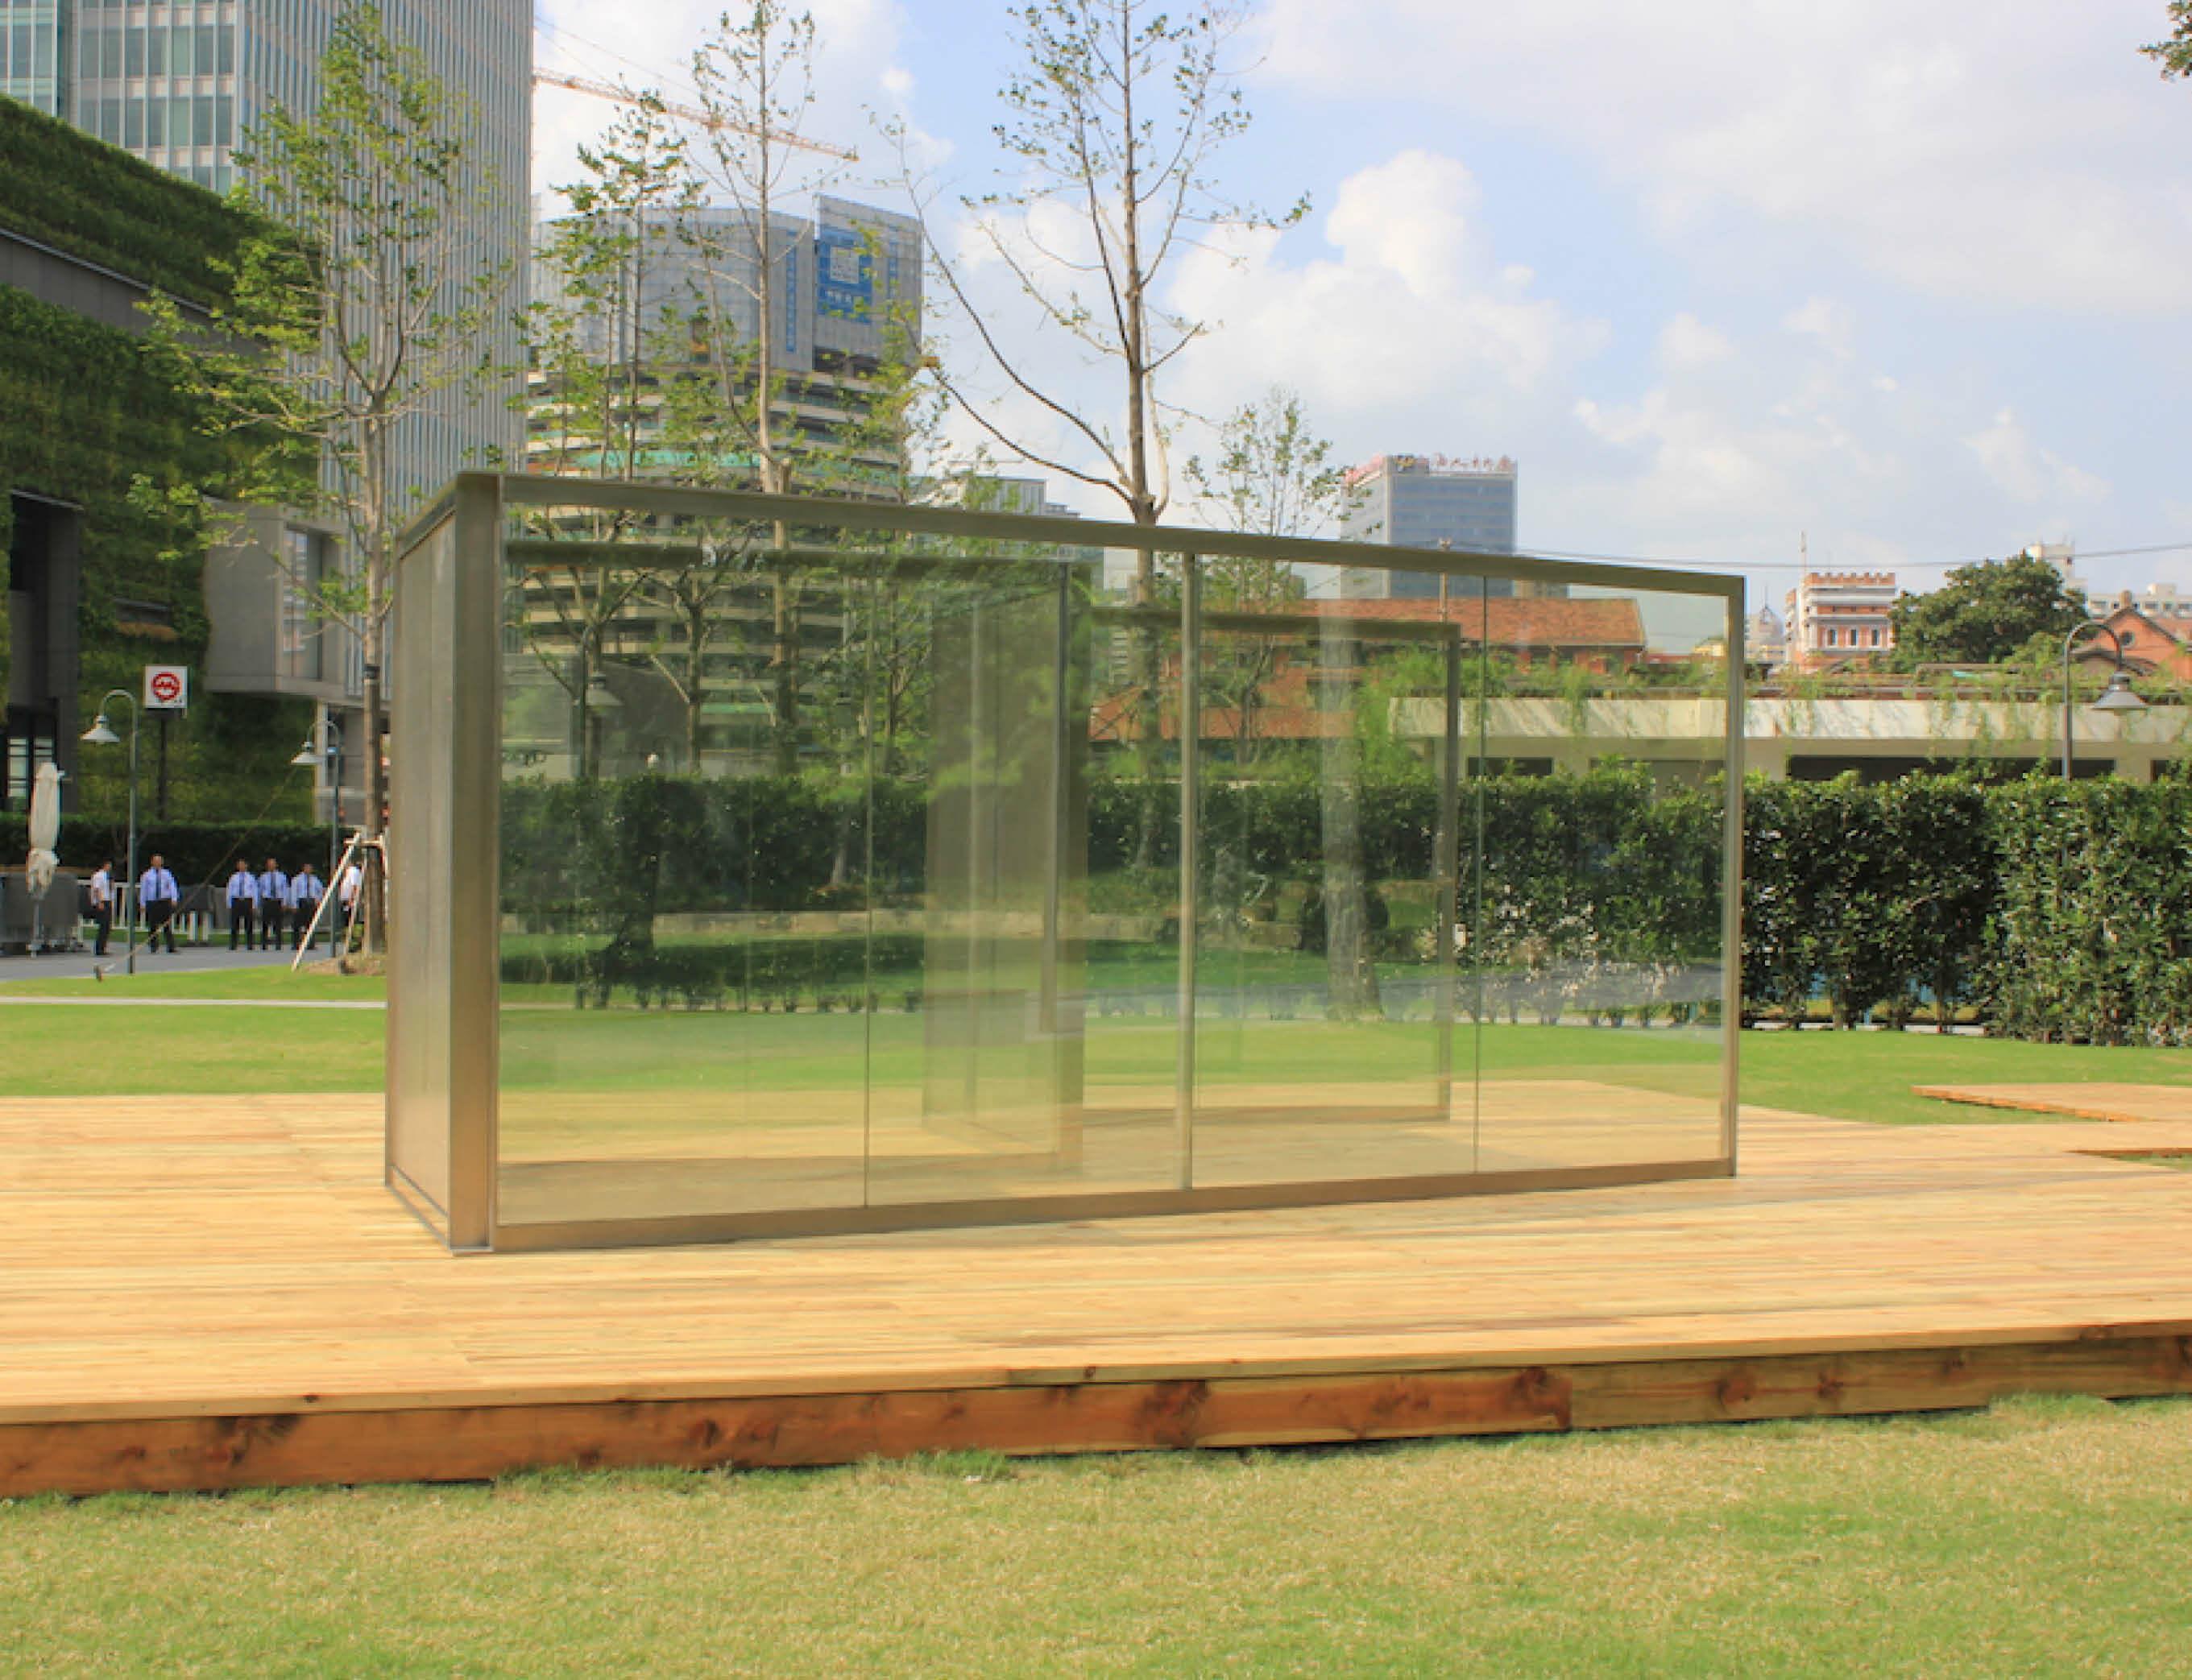 Outdoor pavilion by Dan Graham presented for Frieze Sculpture 2018